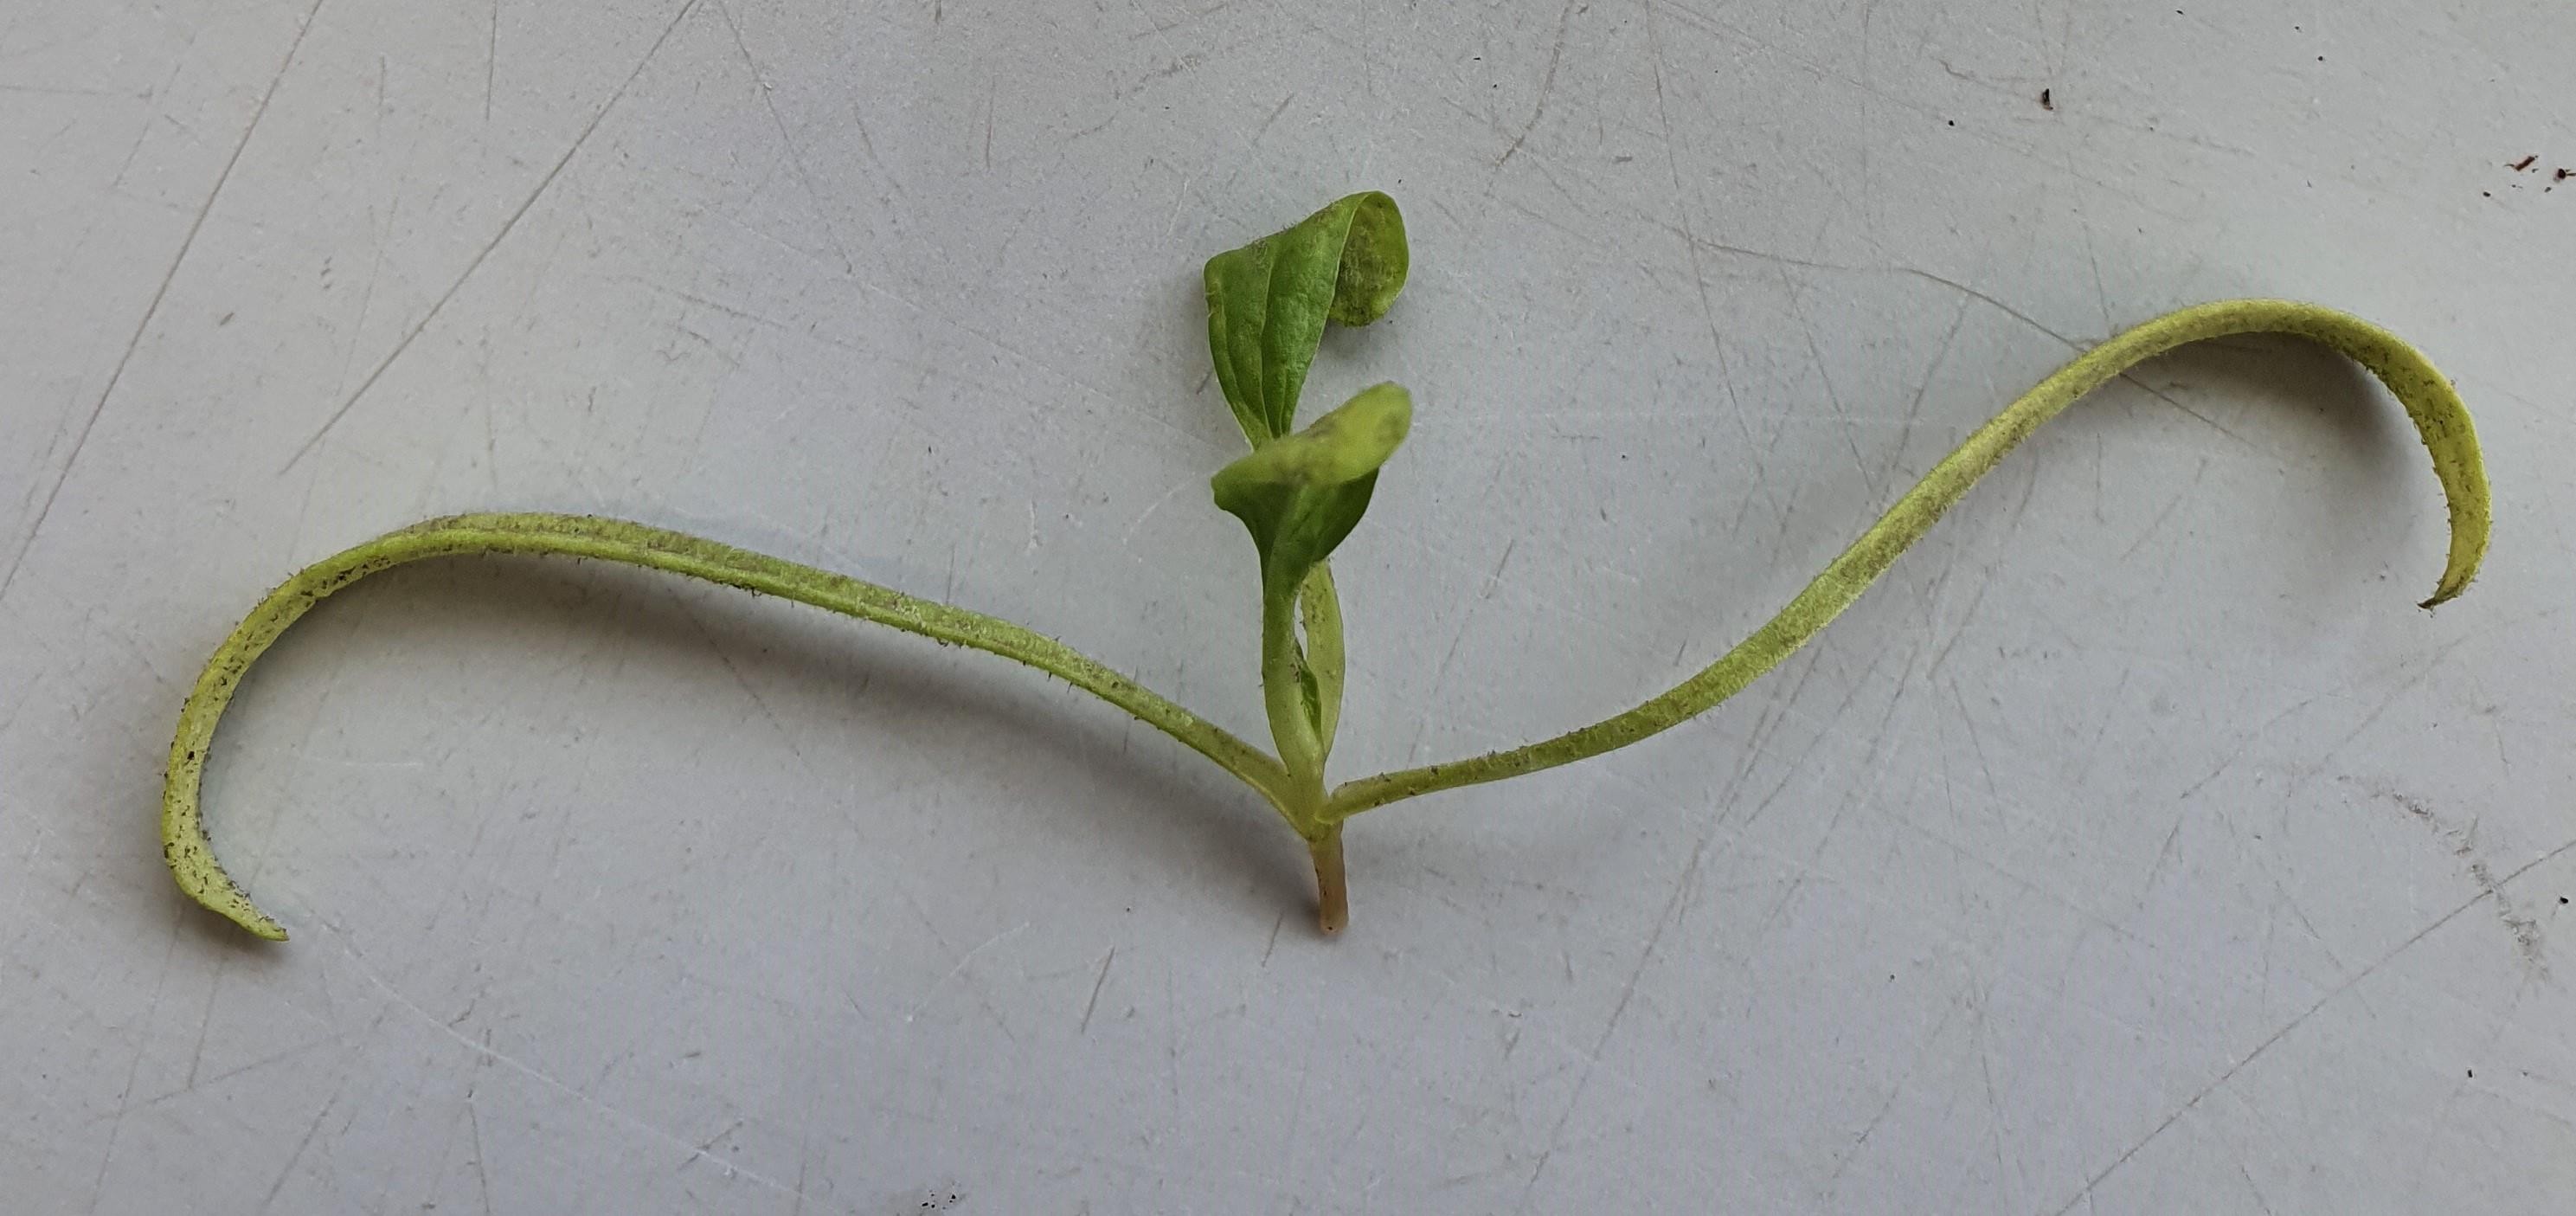 Downey mildew in Spinach